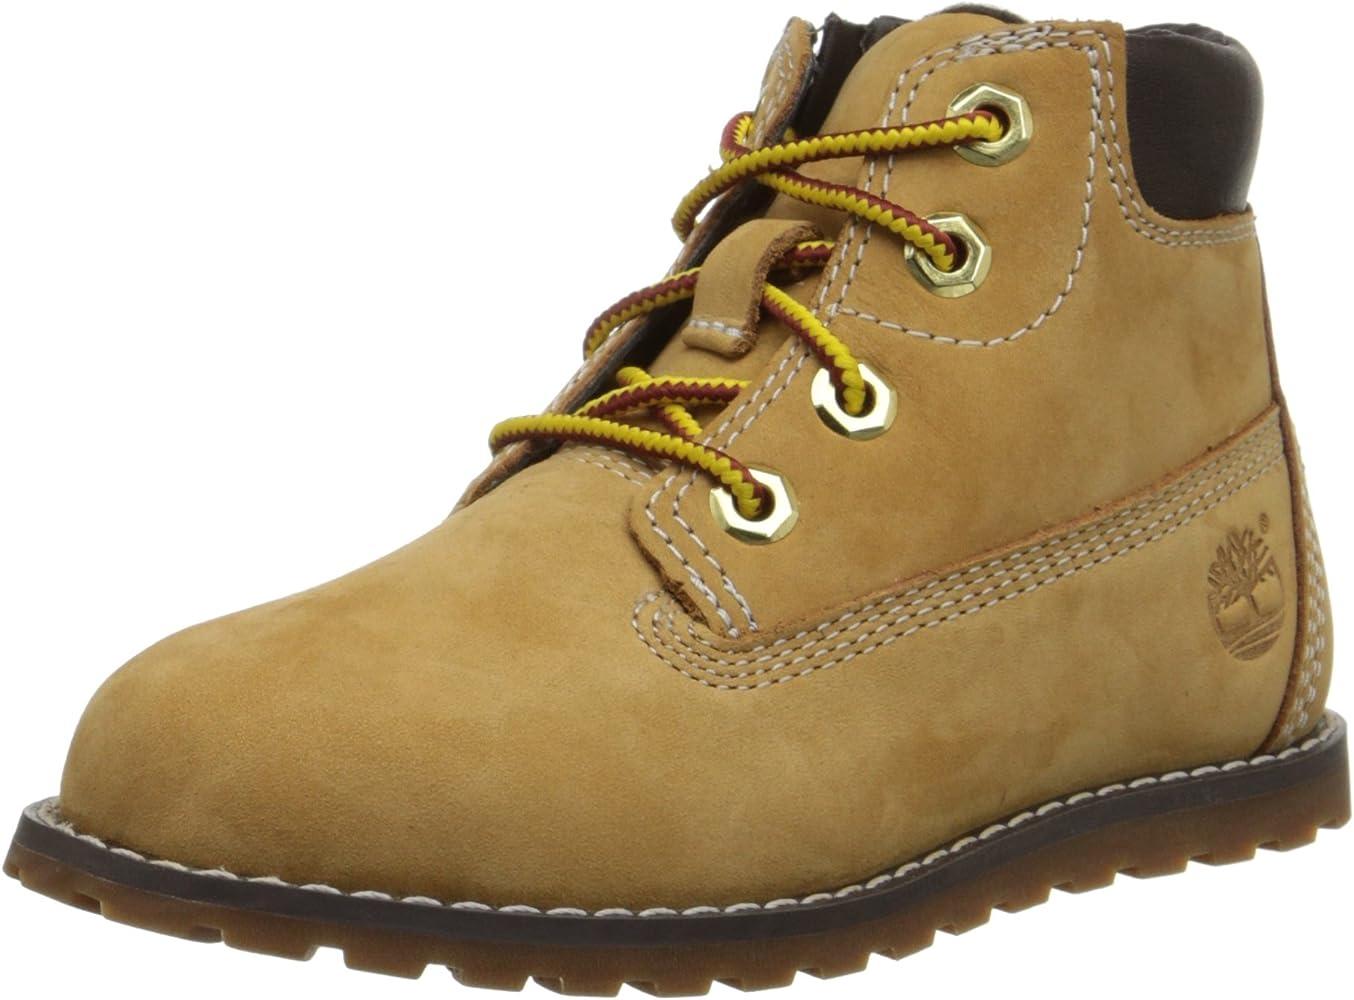 forma elegante marchio famoso prezzo più economico Timberland Unisex Kids' Pokey Pine 6In Boot with Side Zip High ...